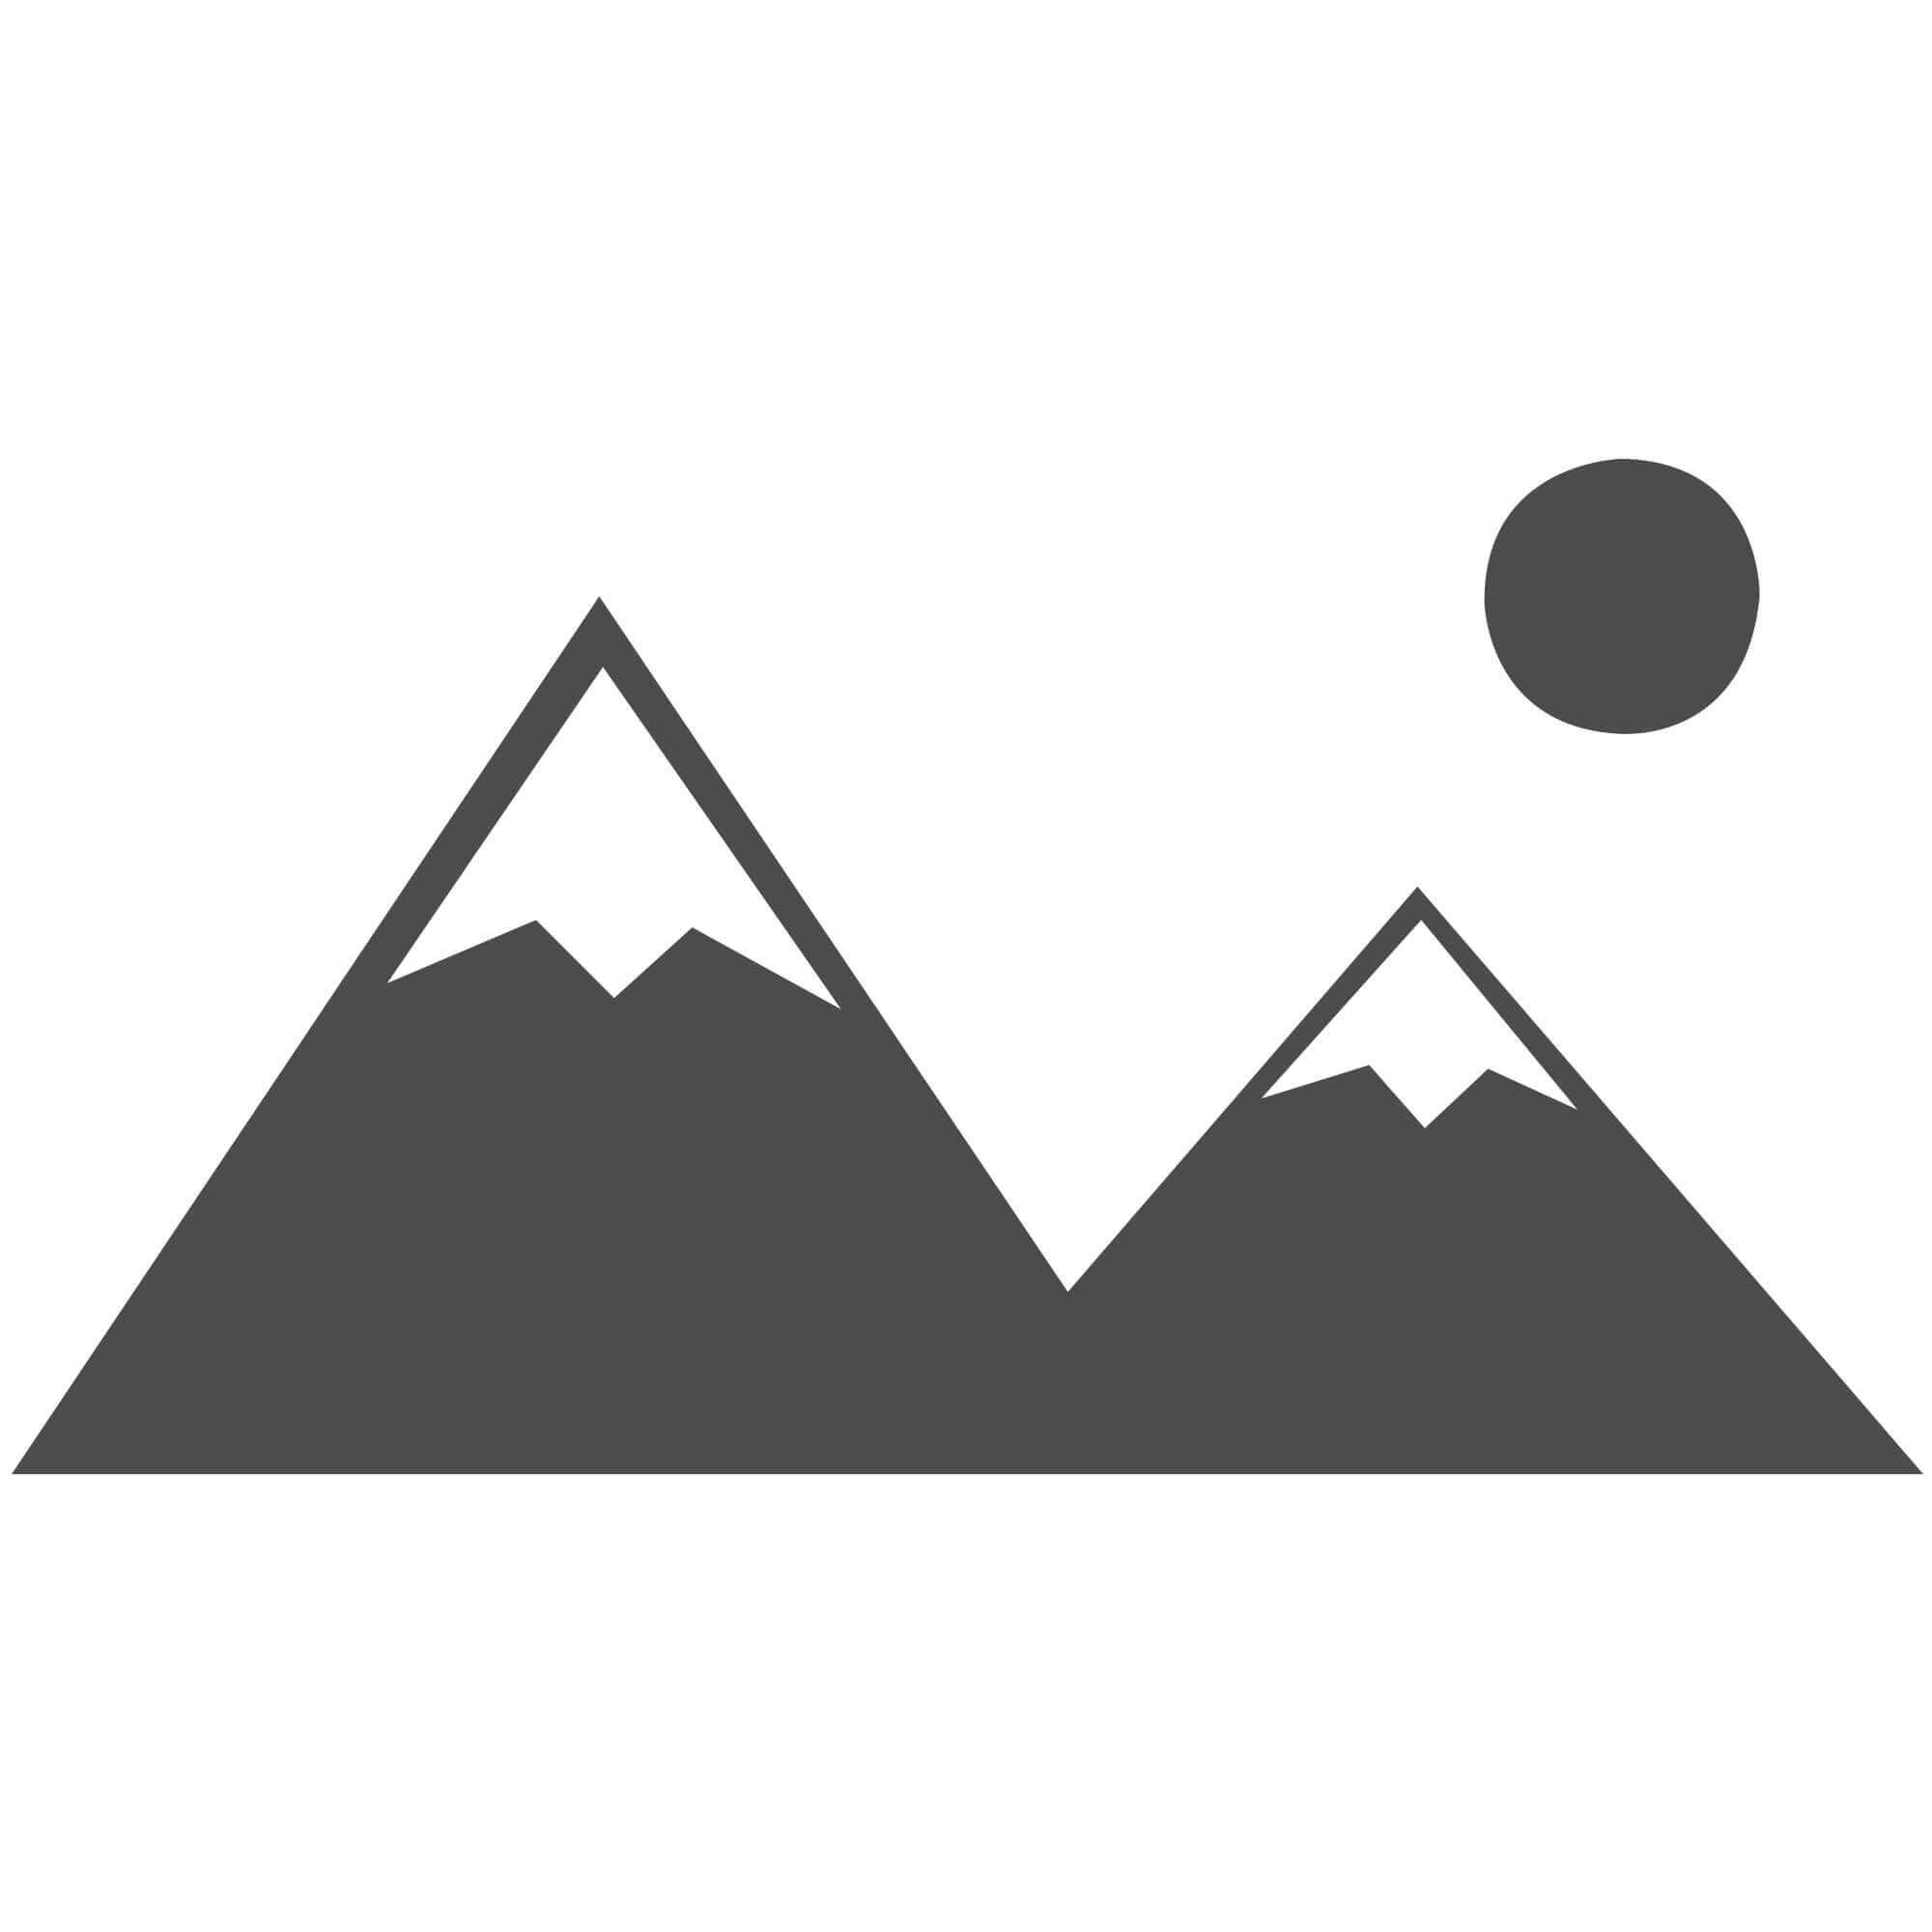 "Florence Alfresco Moretti Rug - Black Beige - Size 200 x 290 cm (6'7"" x 9'6"")"